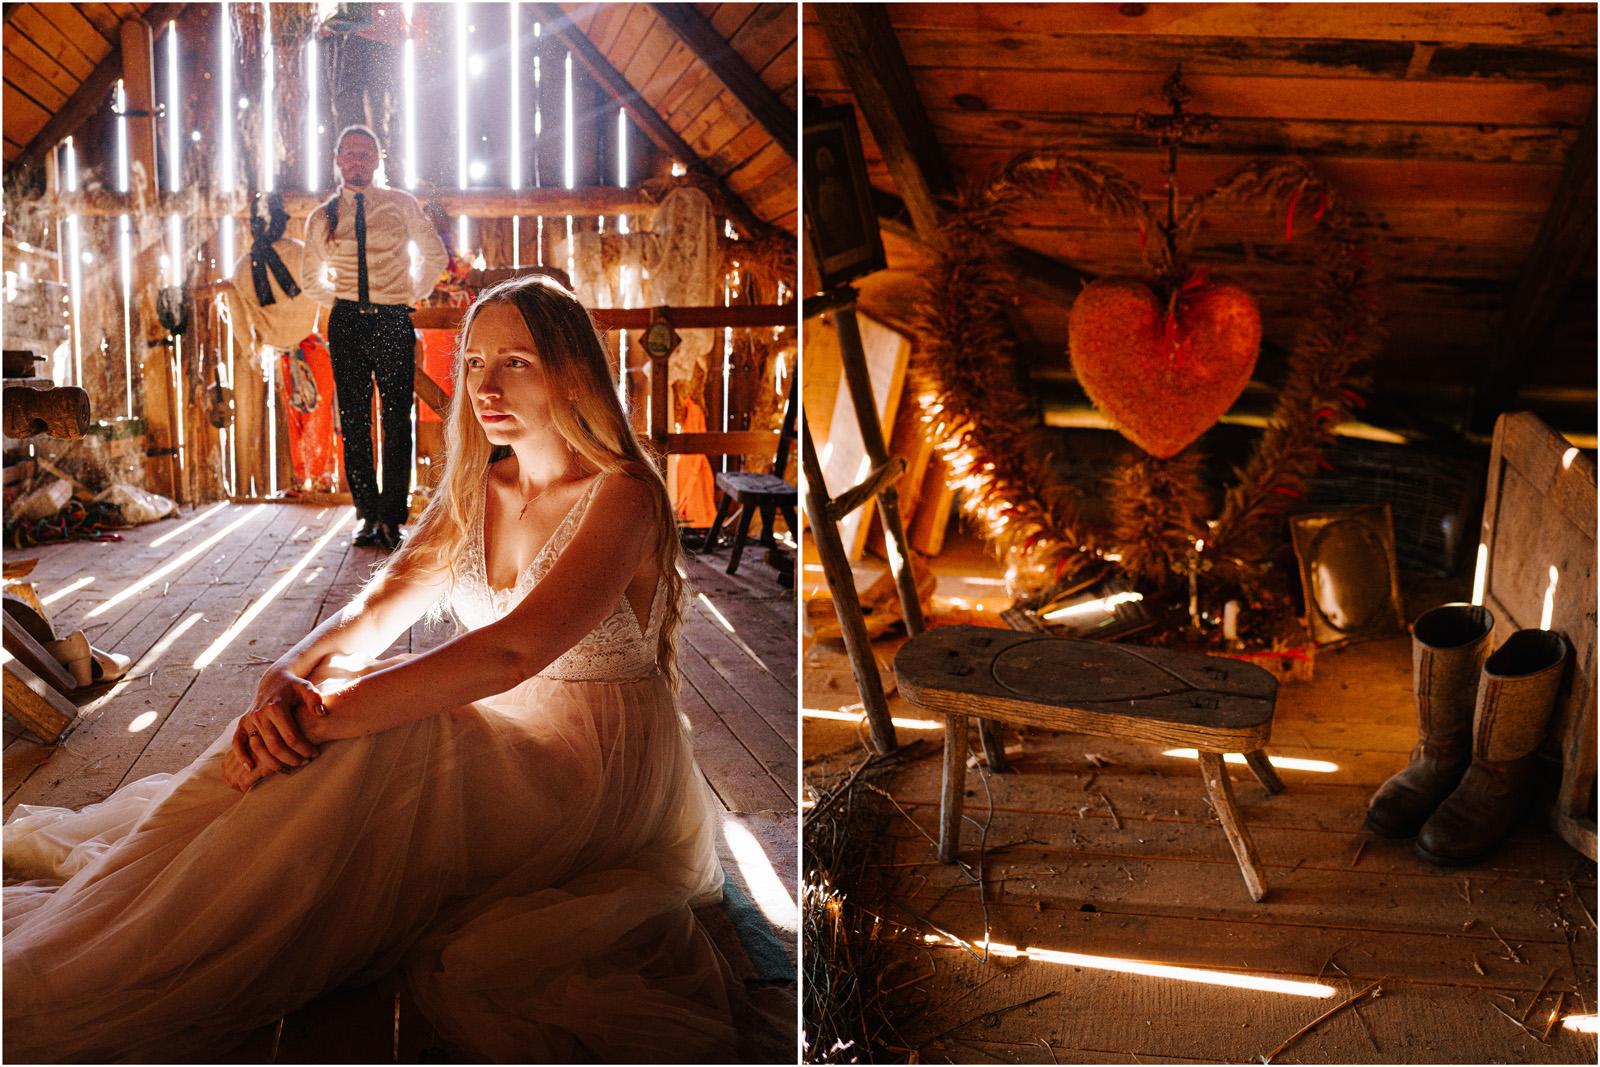 Ewelina & Seweryn | rustykalna sesja w stodole 4